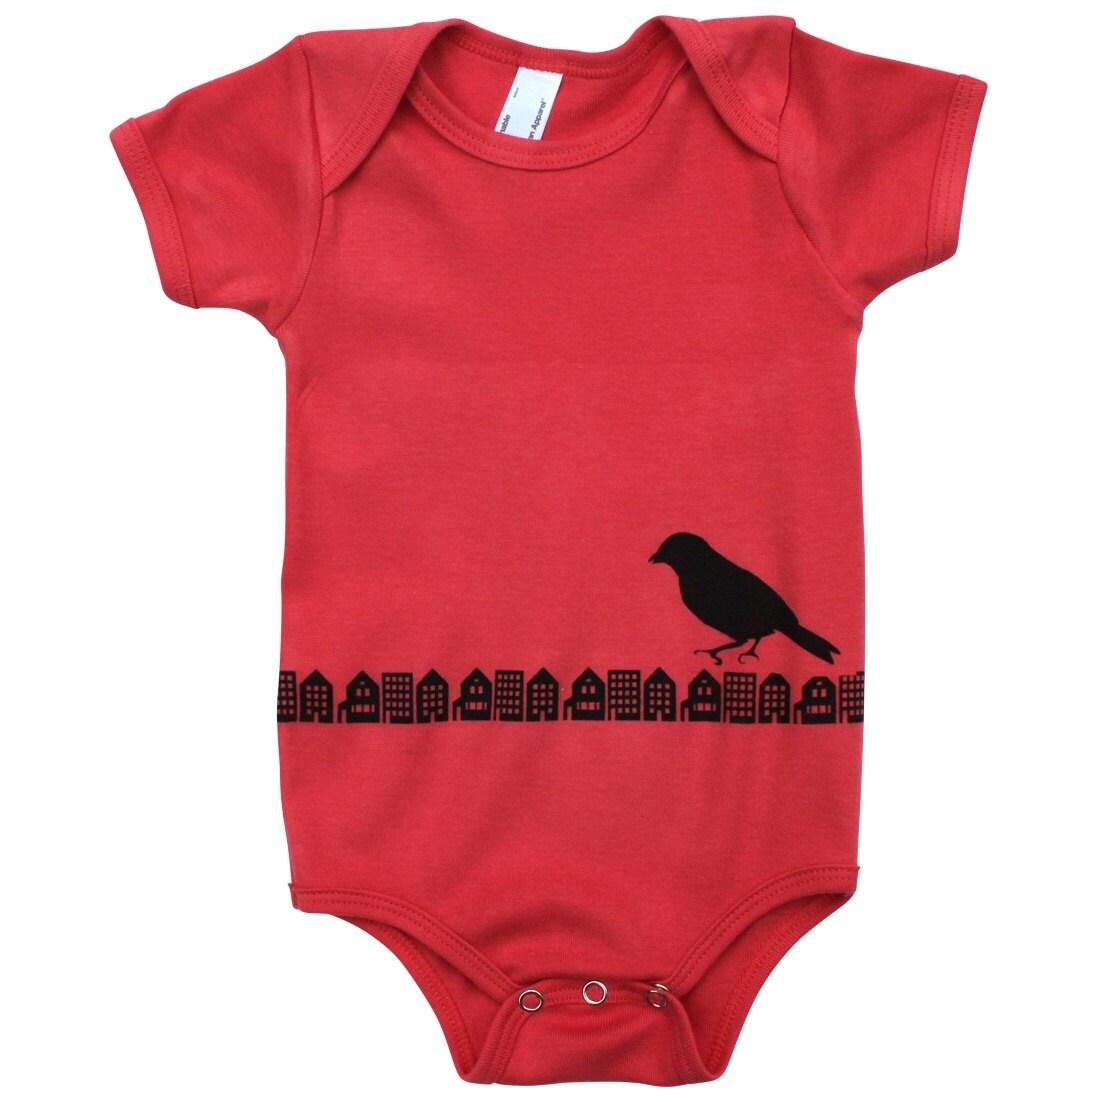 Brooklyn Gotham Bird Baby Onesie, Hand-Printed Lithograph, Organic Infant Bodysuit, 3-6 months